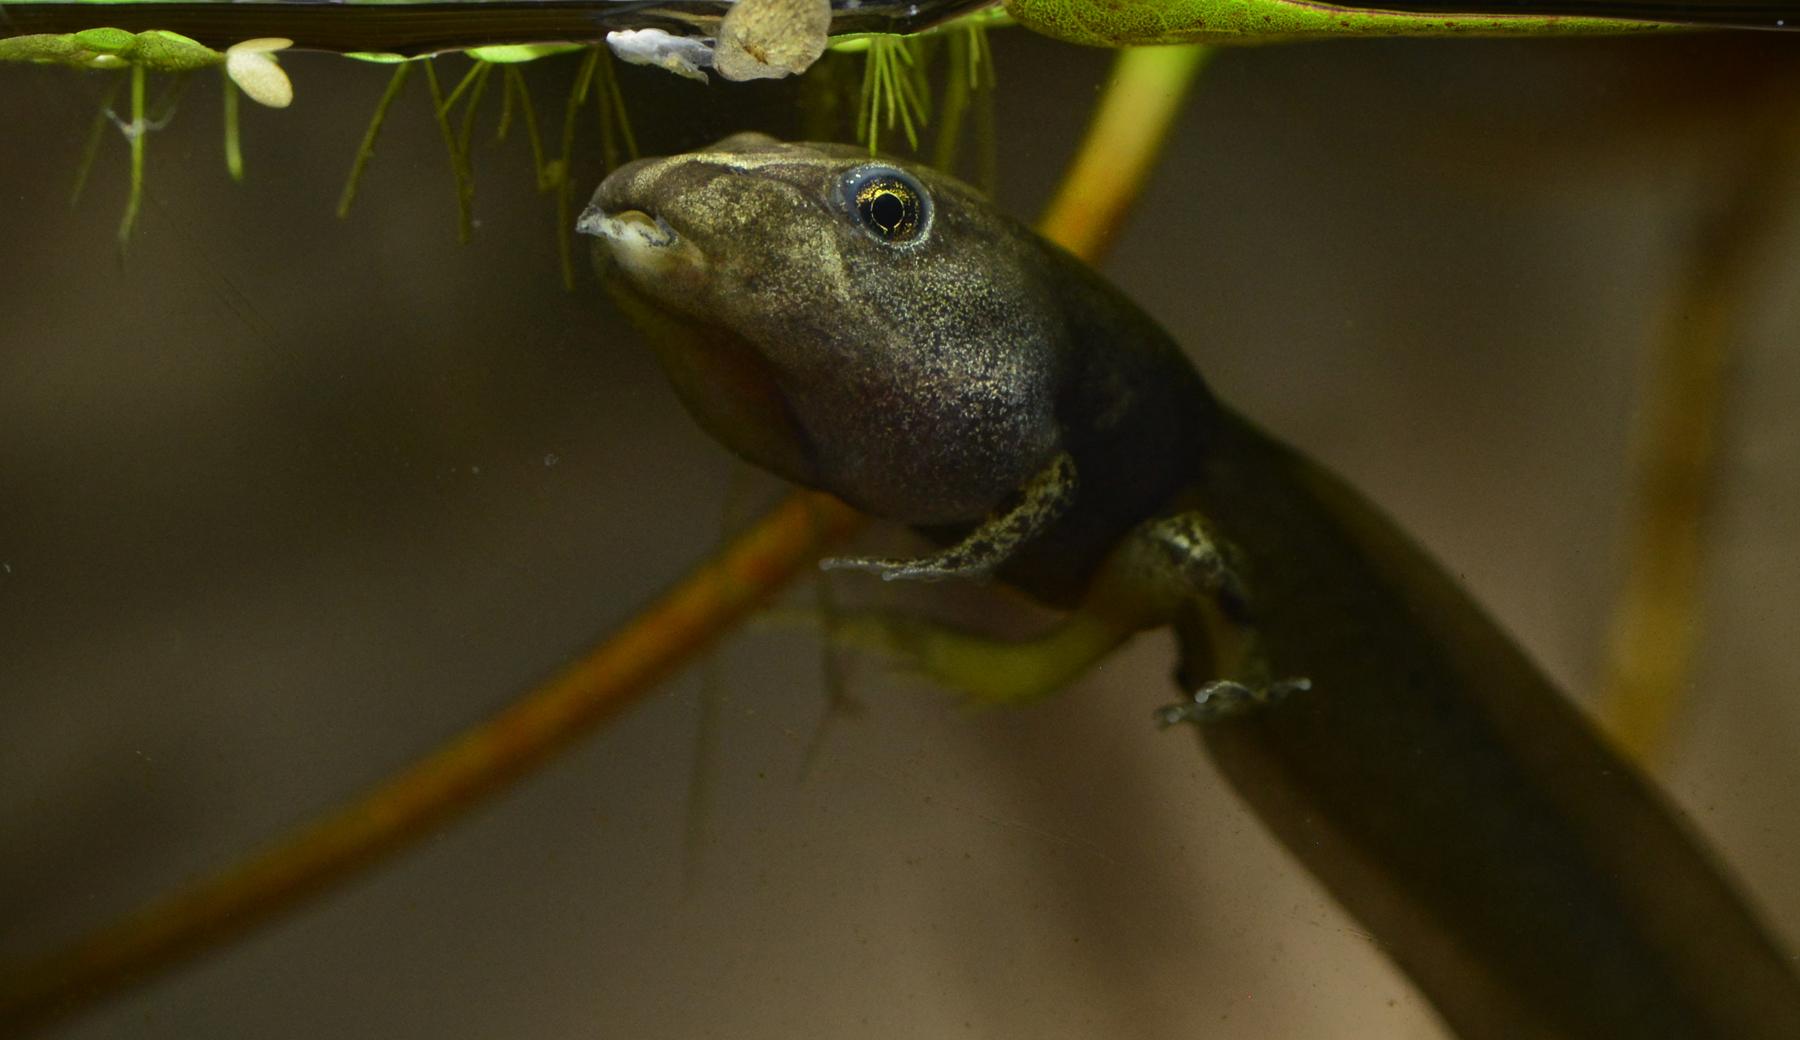 Karen_Burgess_Becoming a frog_2.jpg